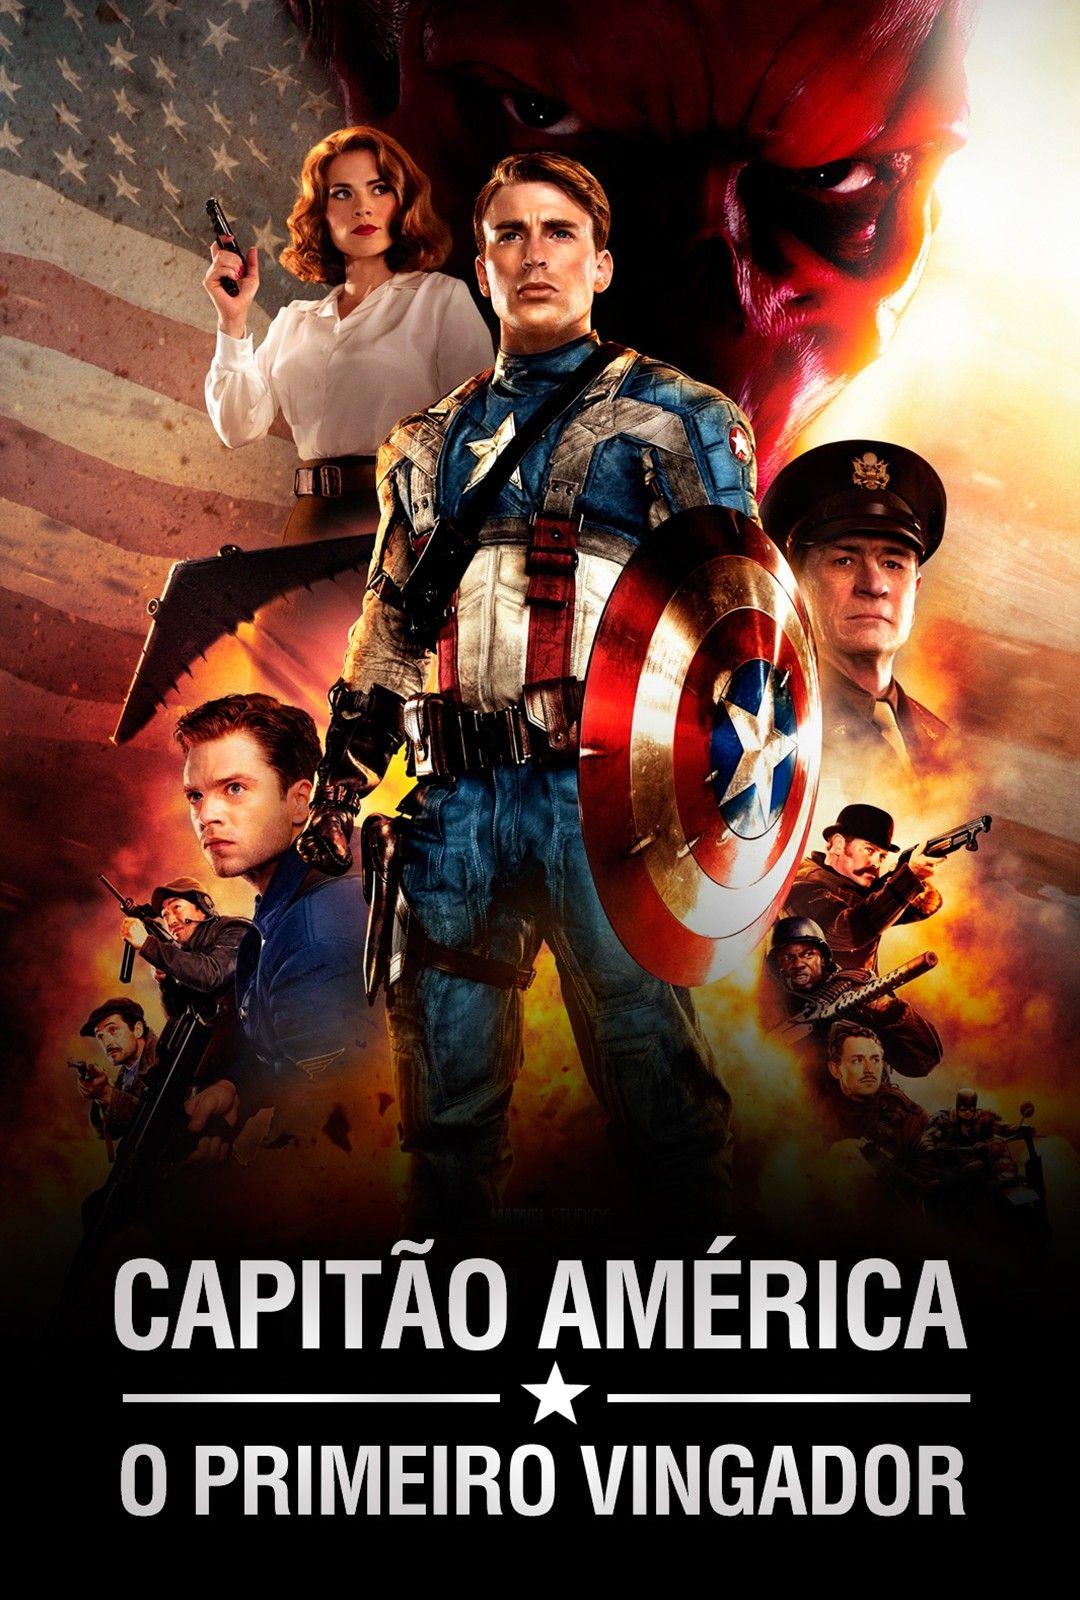 Capitan America El Primer Vengador 2011 Captain America Movie Avengers Poster Avengers Film